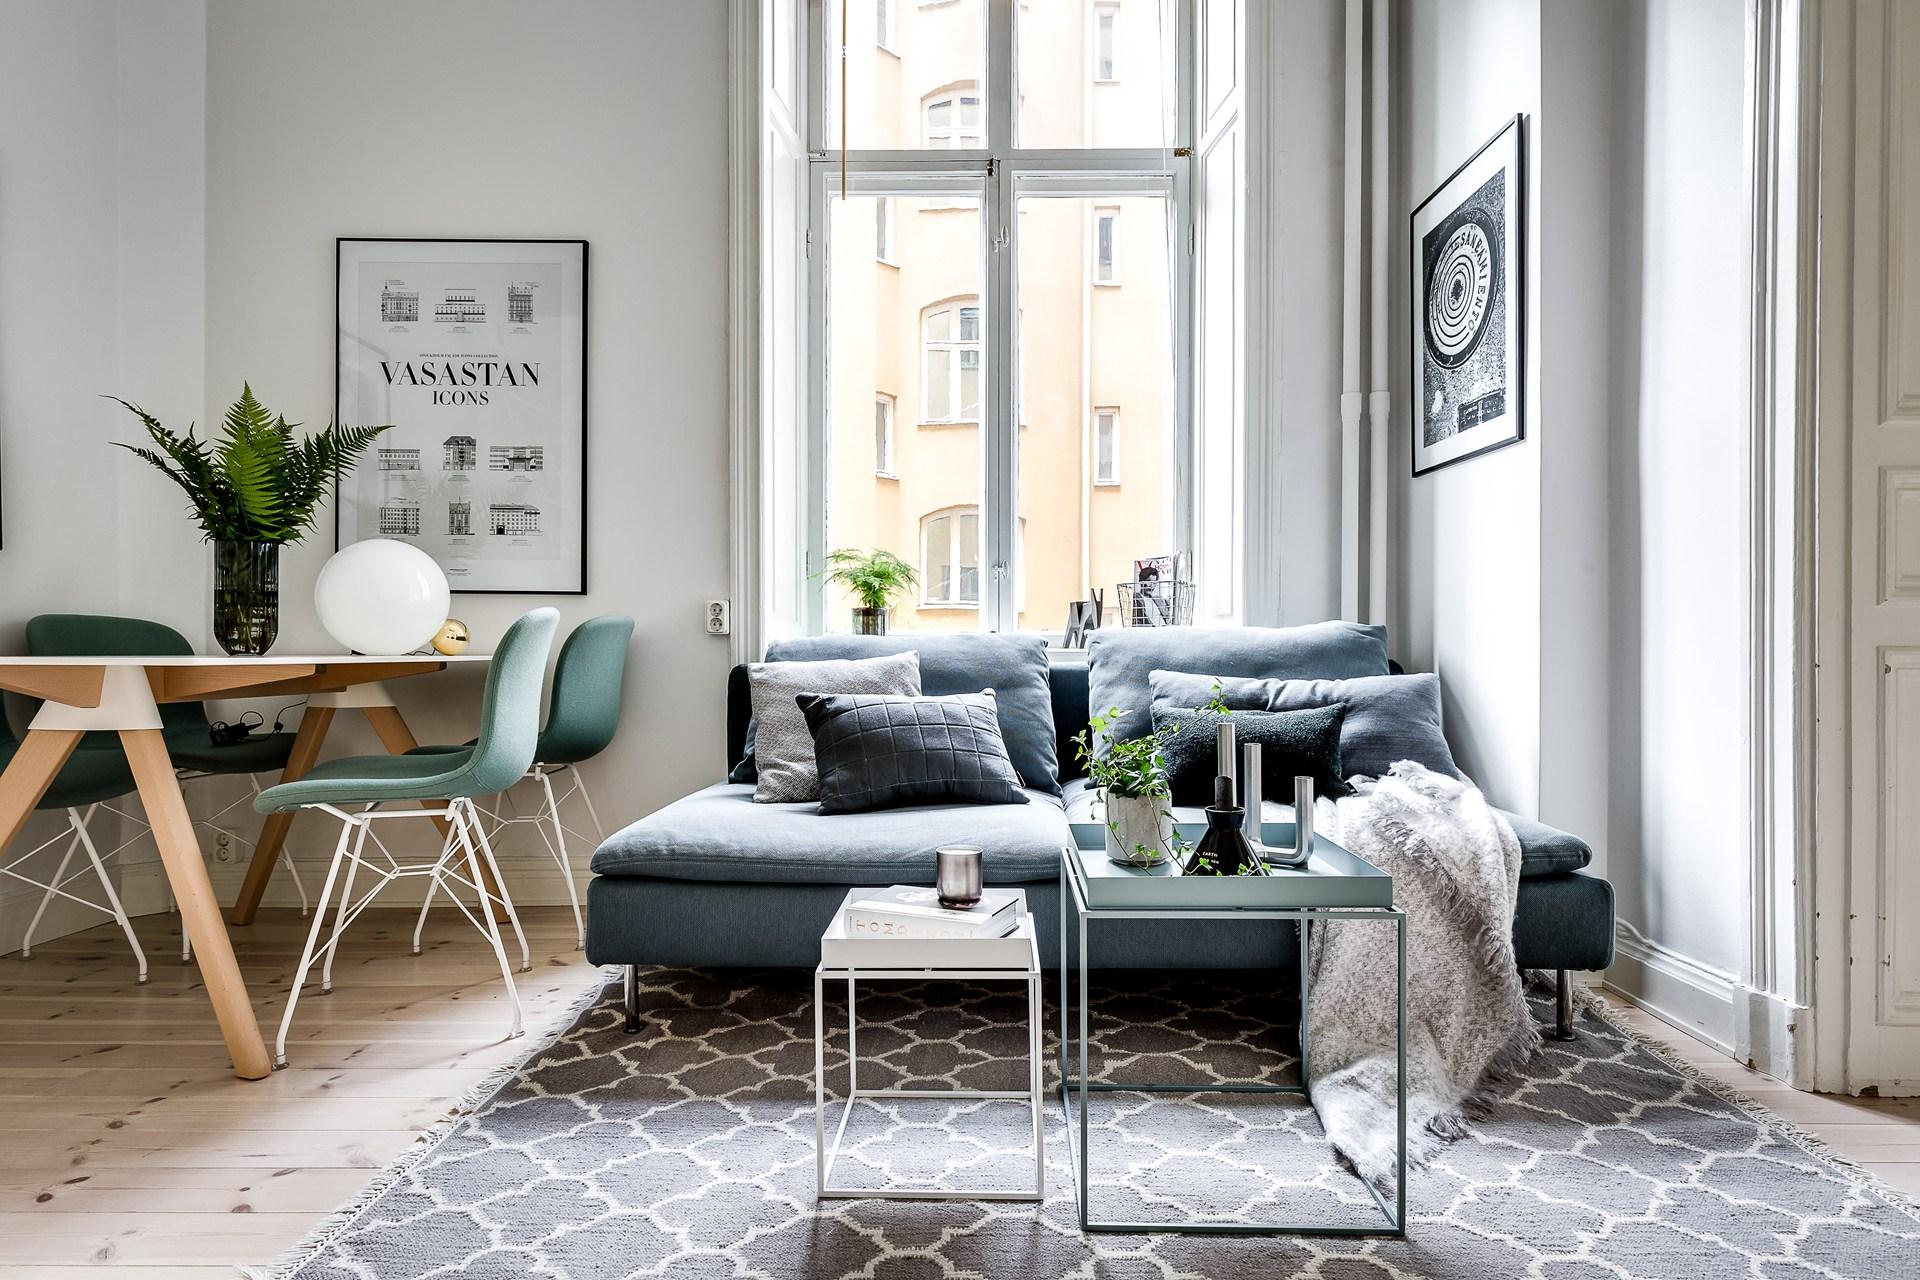 диван столики ковер обеденный стол окно